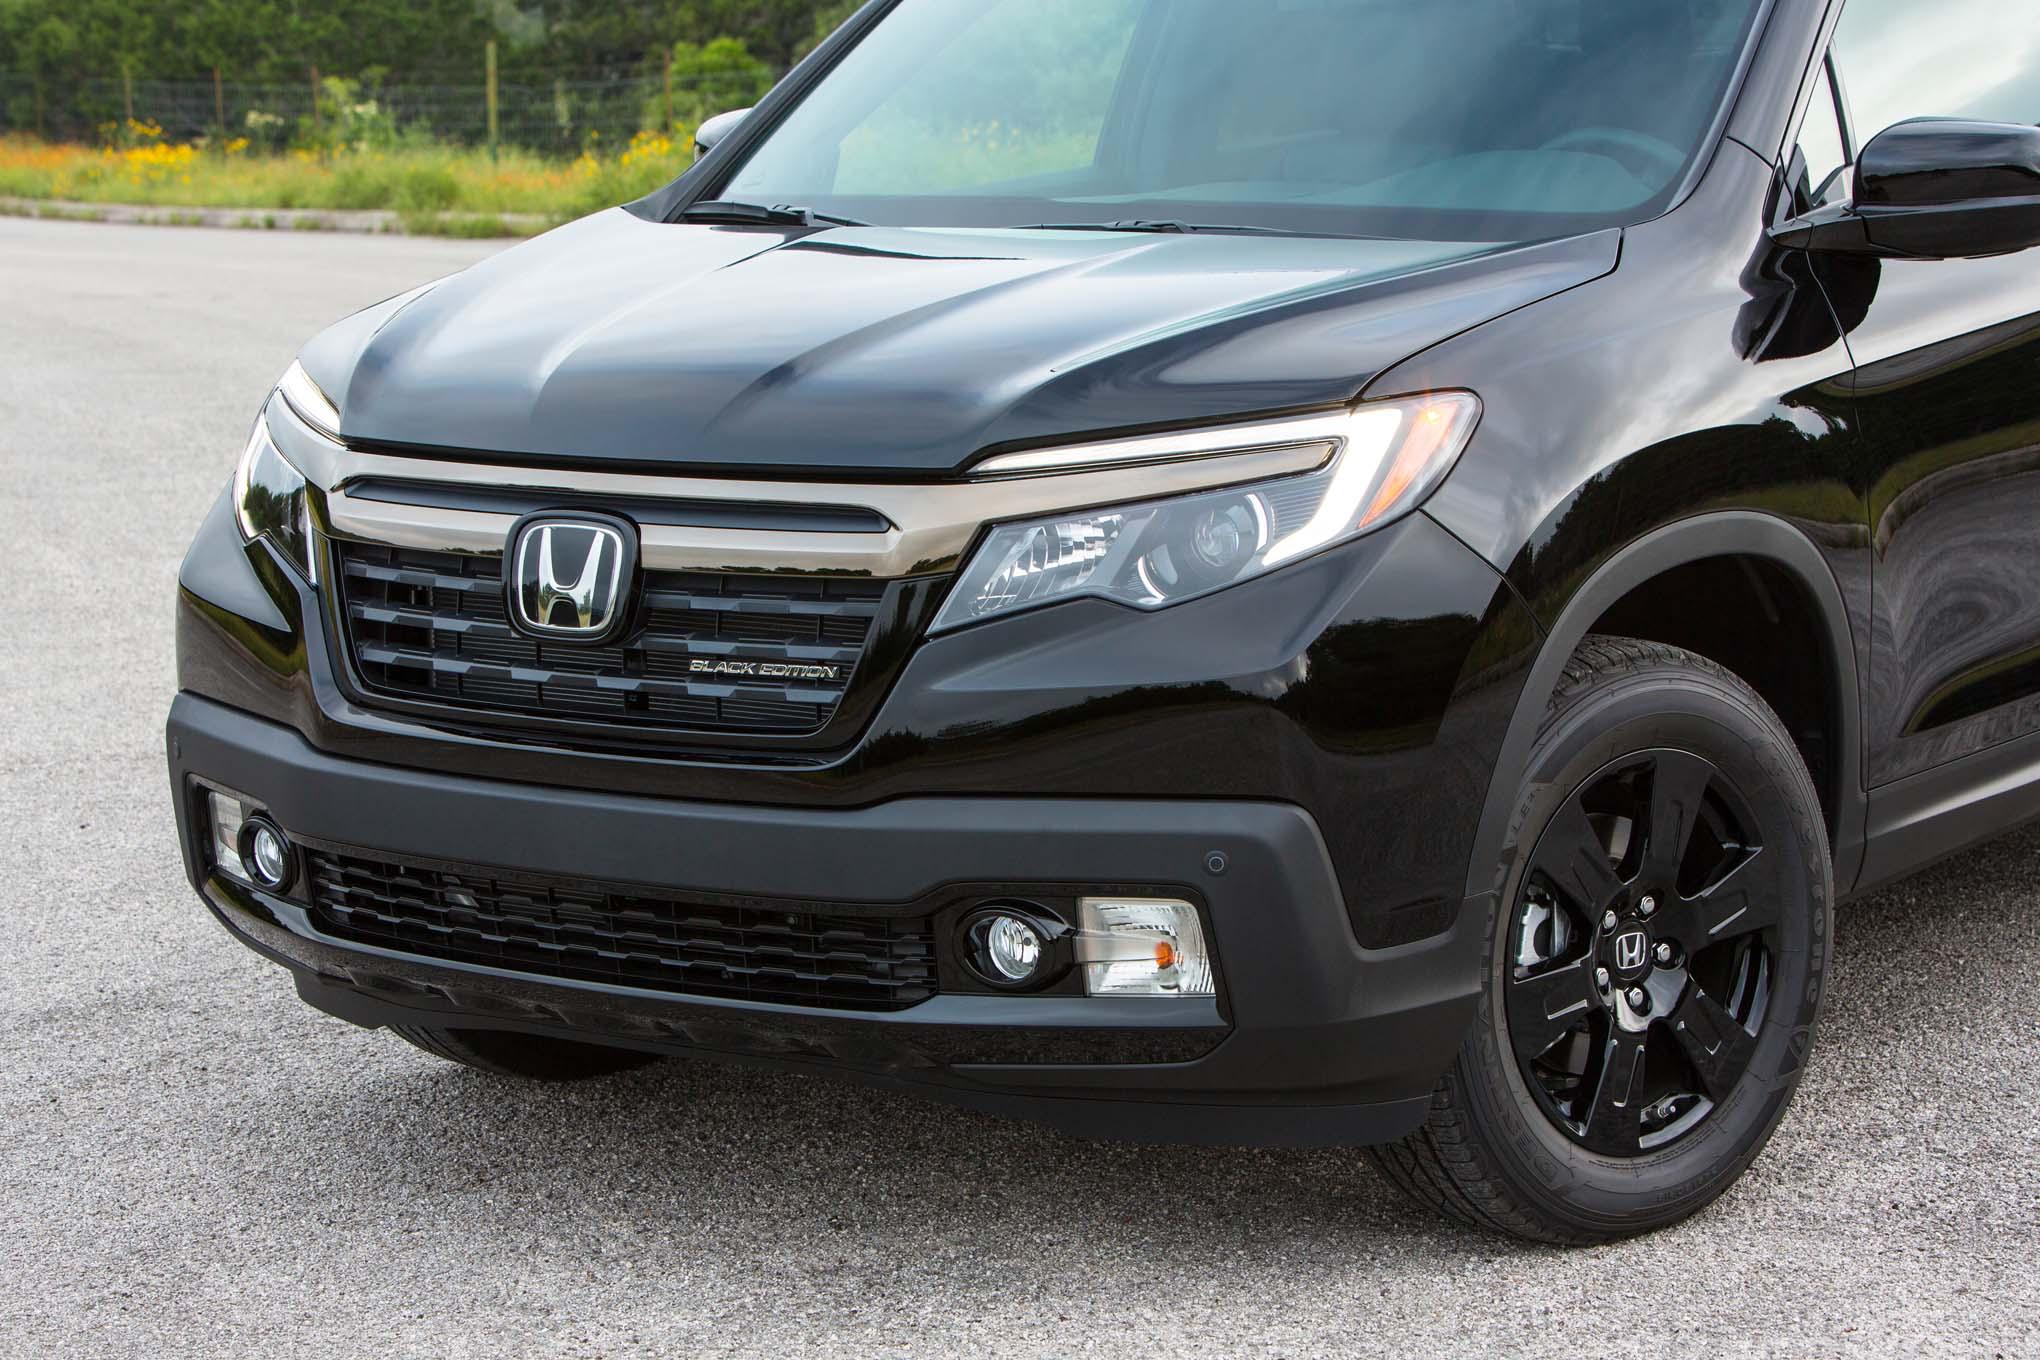 2017 Honda Ridgeline Black Edition front grille